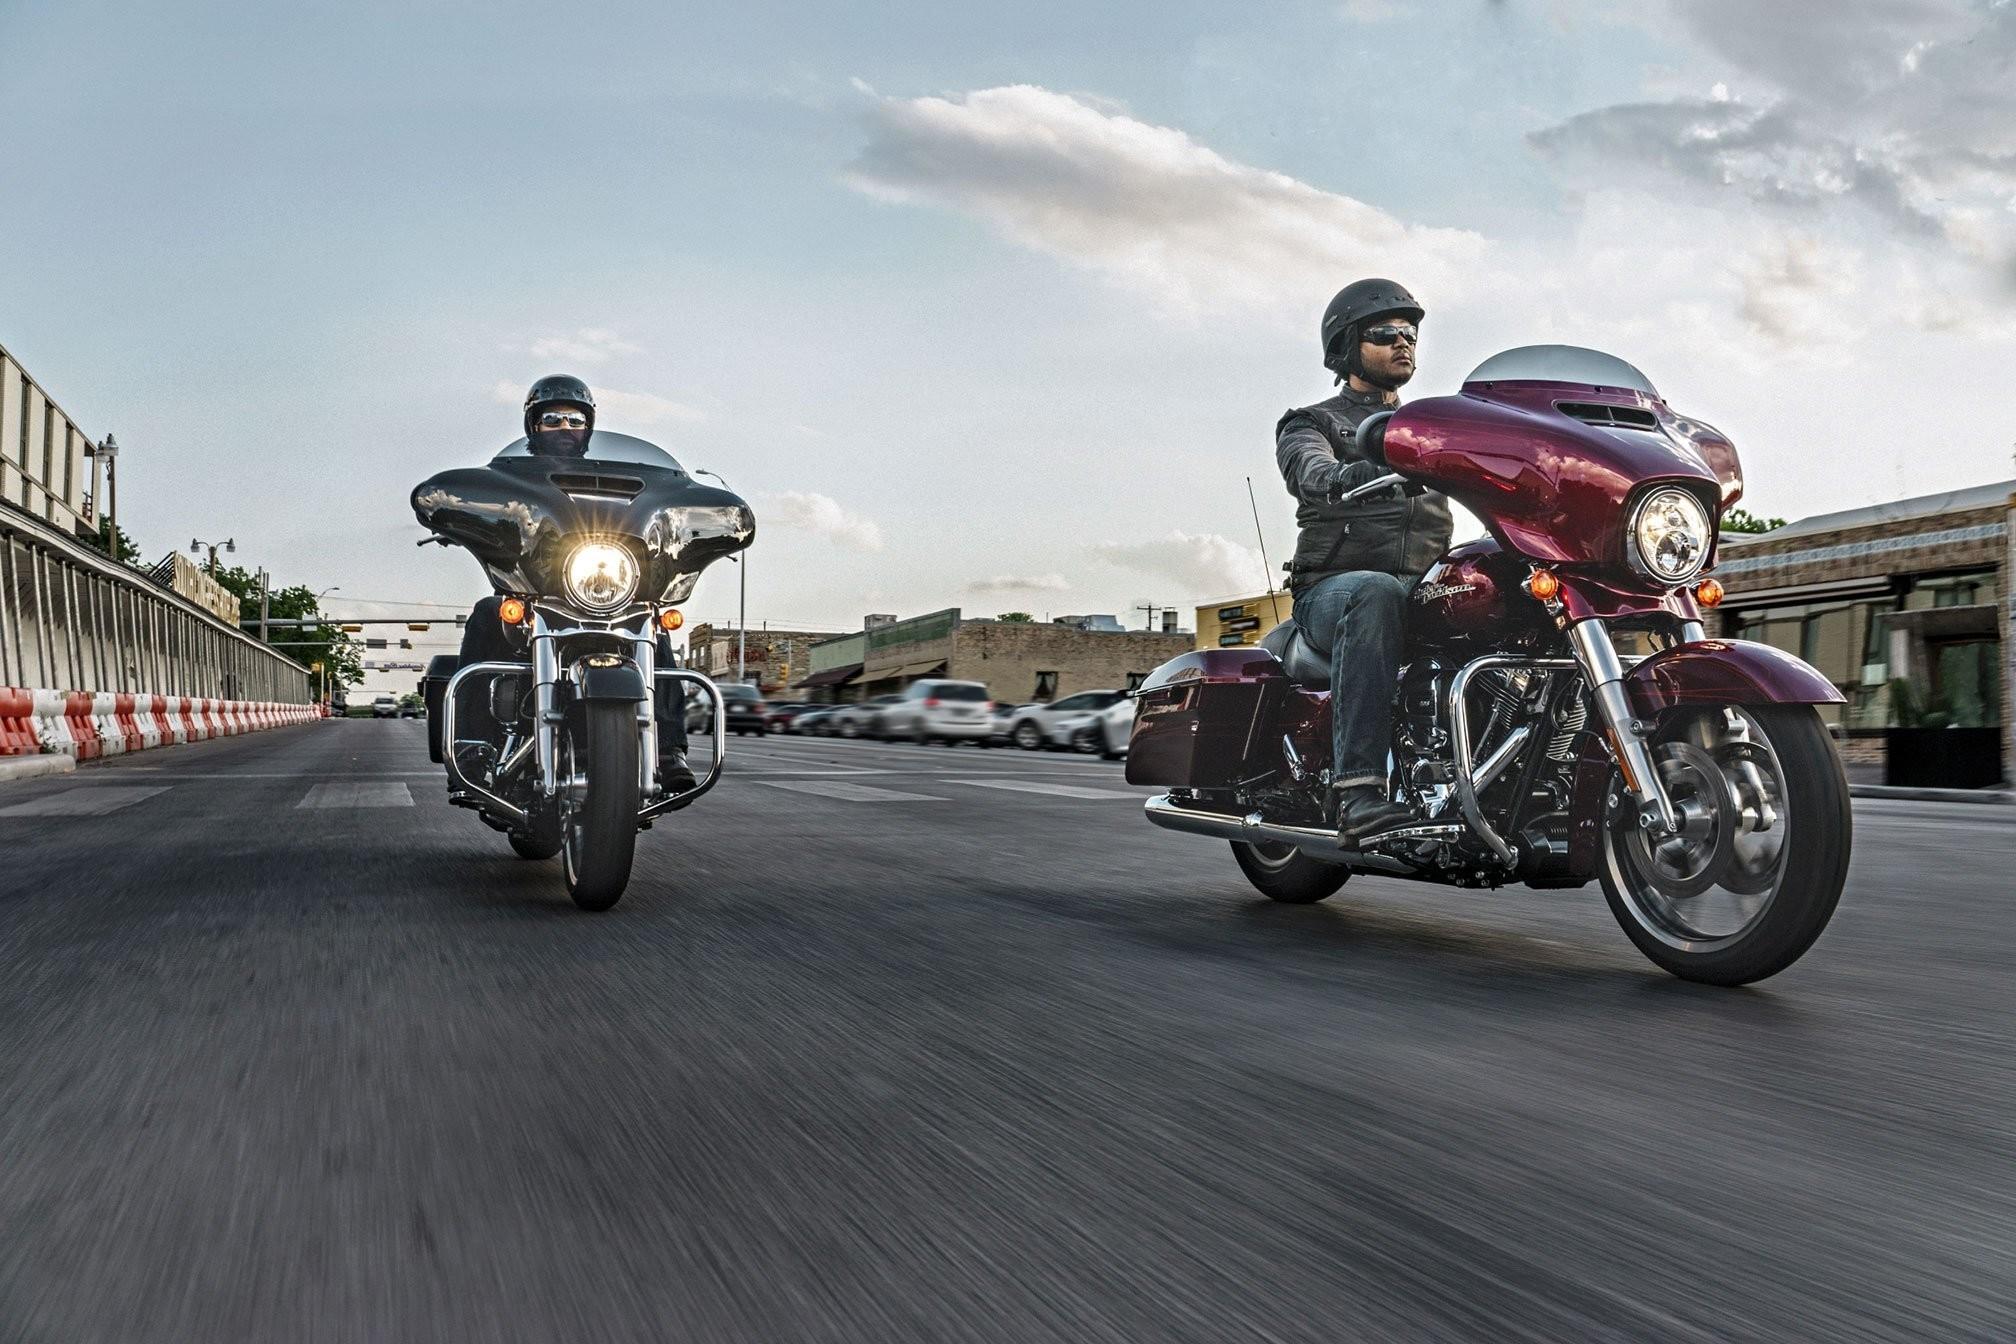 Street bike wallpapers 61 images 2560x1440 harley davidson motorcycles wallpaper 25601440 voltagebd Choice Image